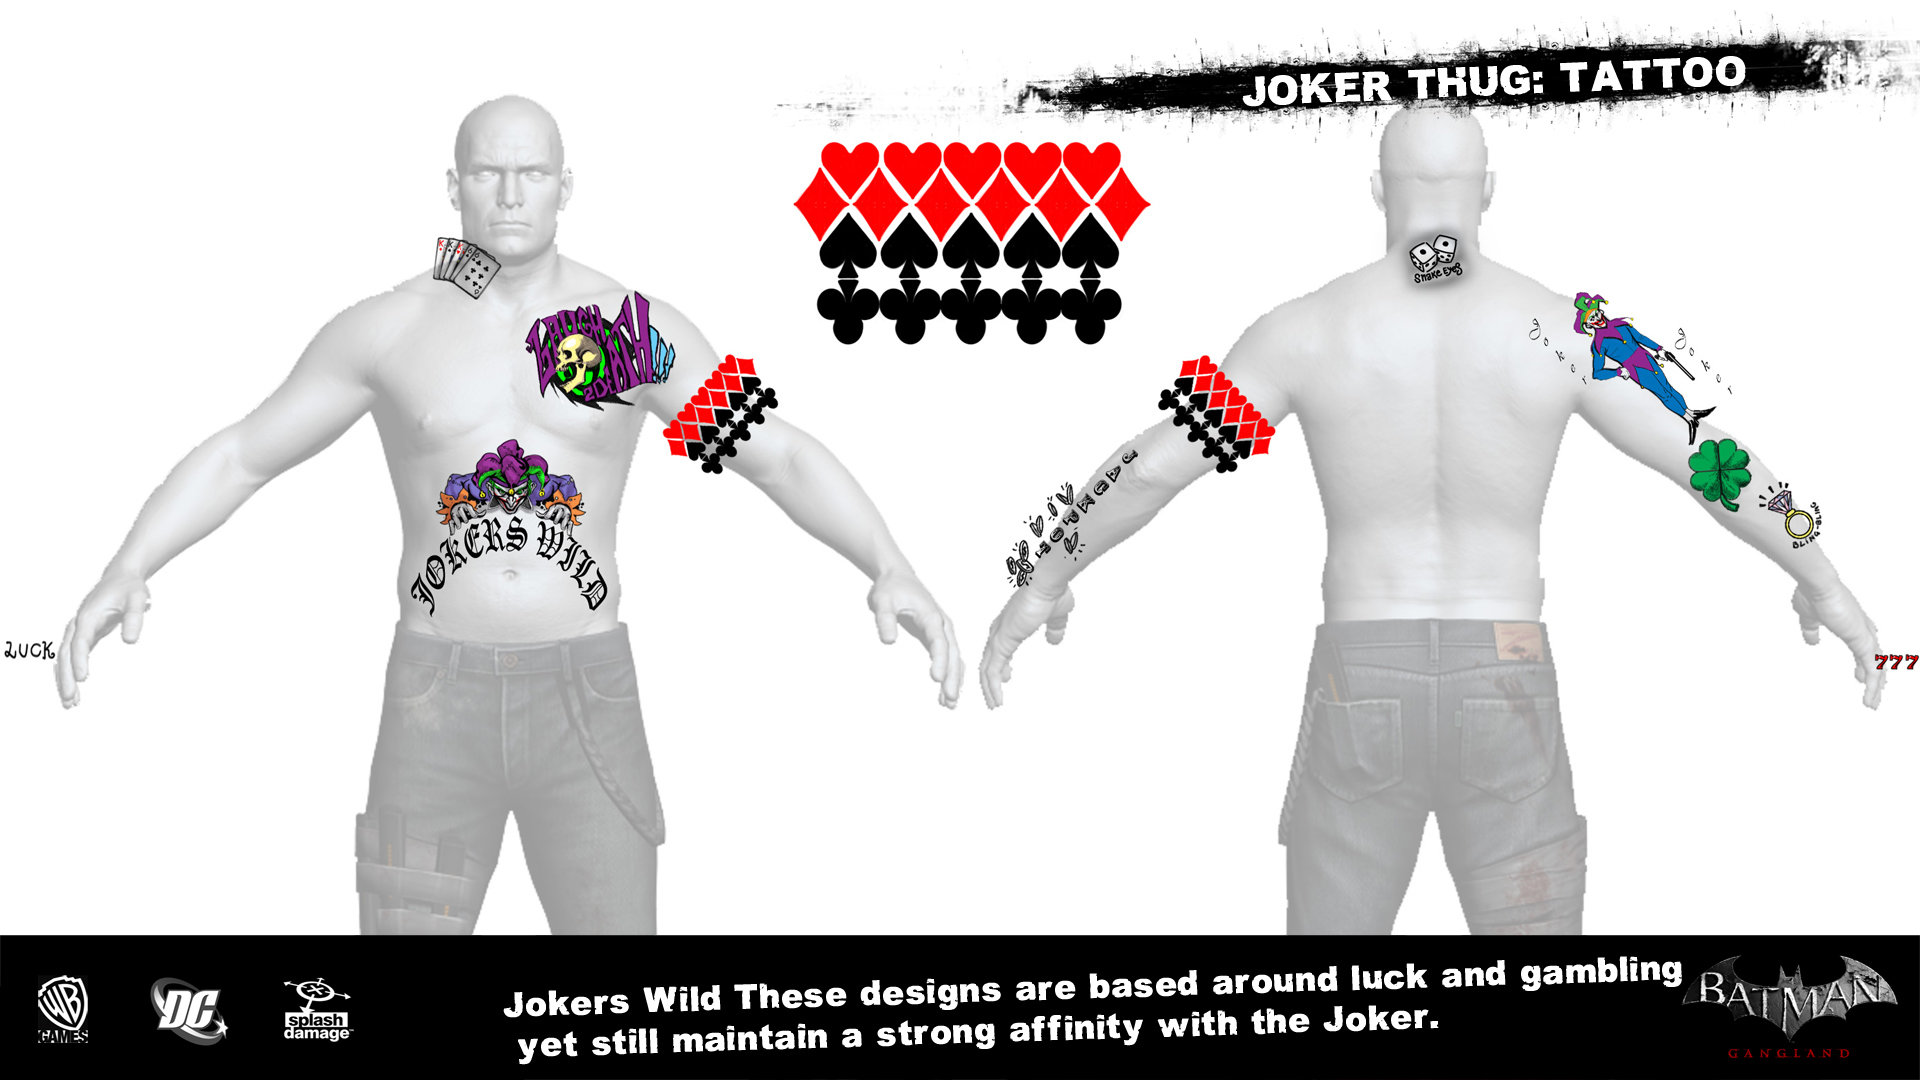 Manuel augusto dischinger moura splashdamage joker thug tattoo 4